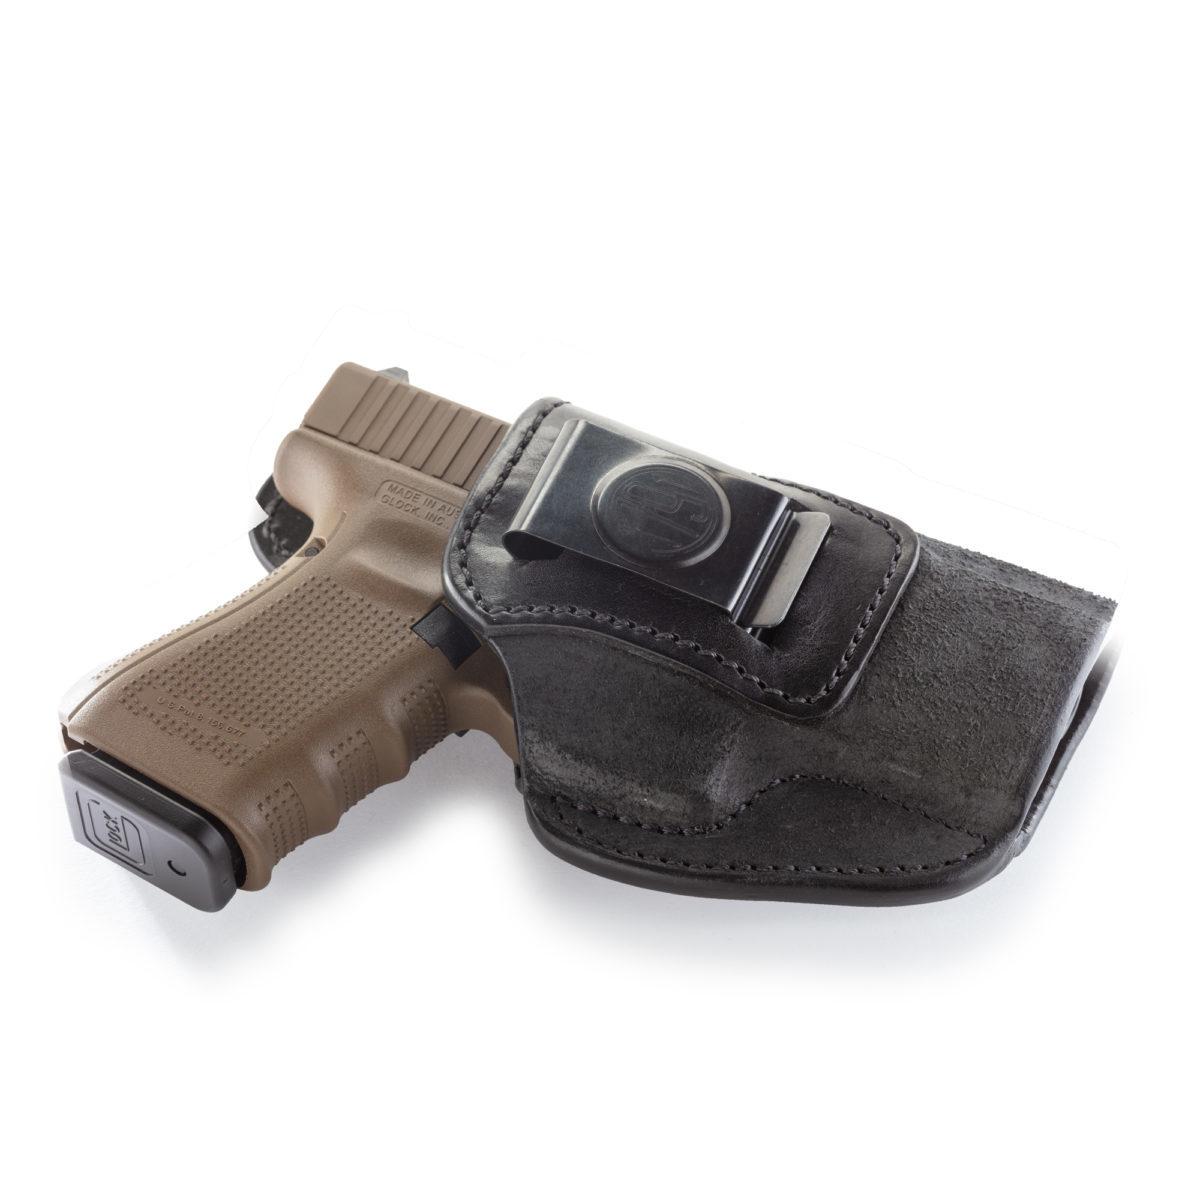 RCH - Rigid Concealment Holster